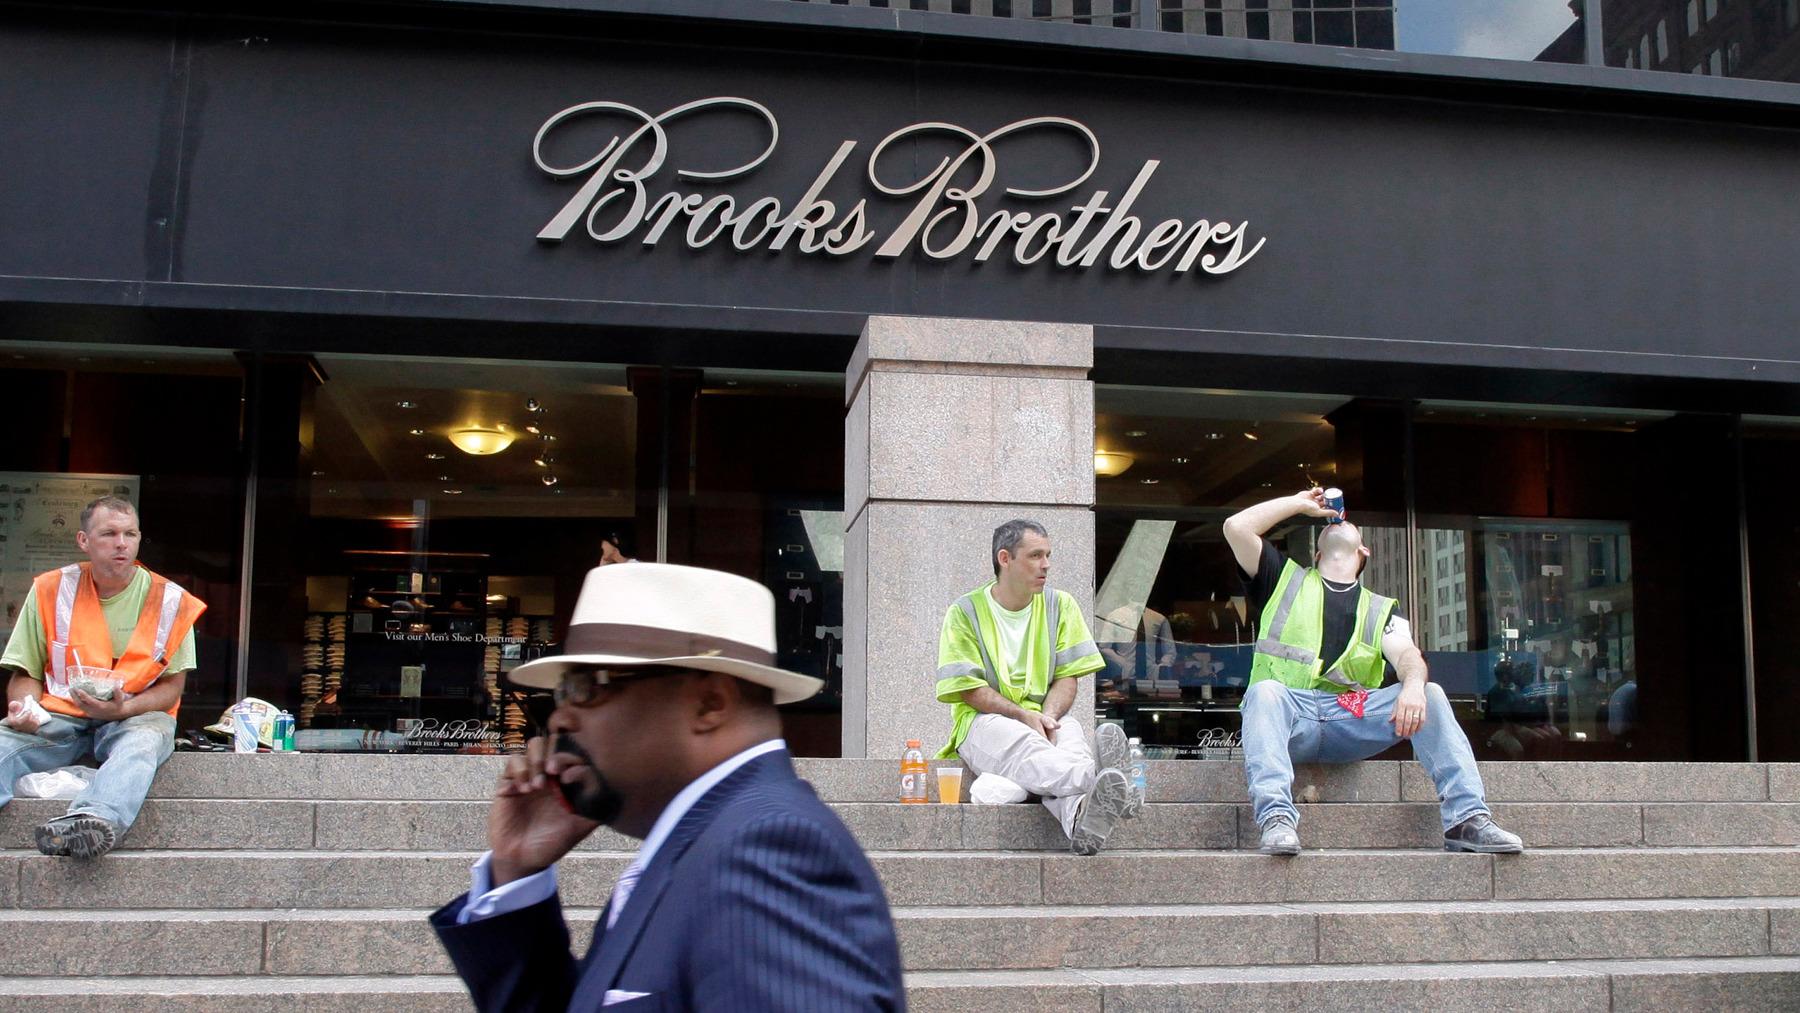 nikkei.com - Staff Writer - Coronavirus latest: Brooks Brothers files for bankruptcy